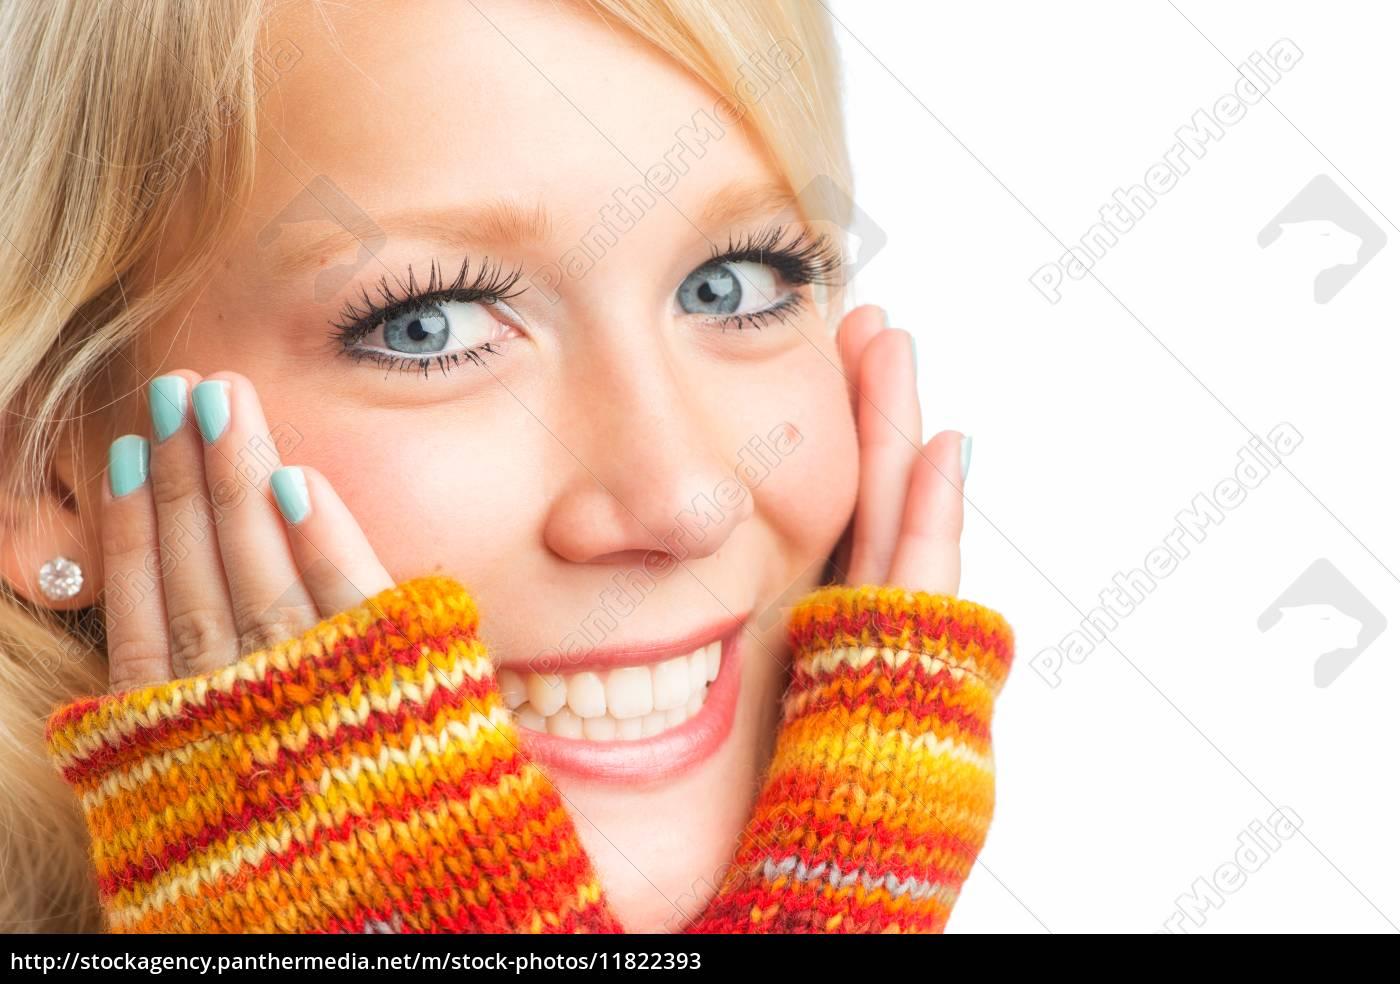 woman, face - 11822393